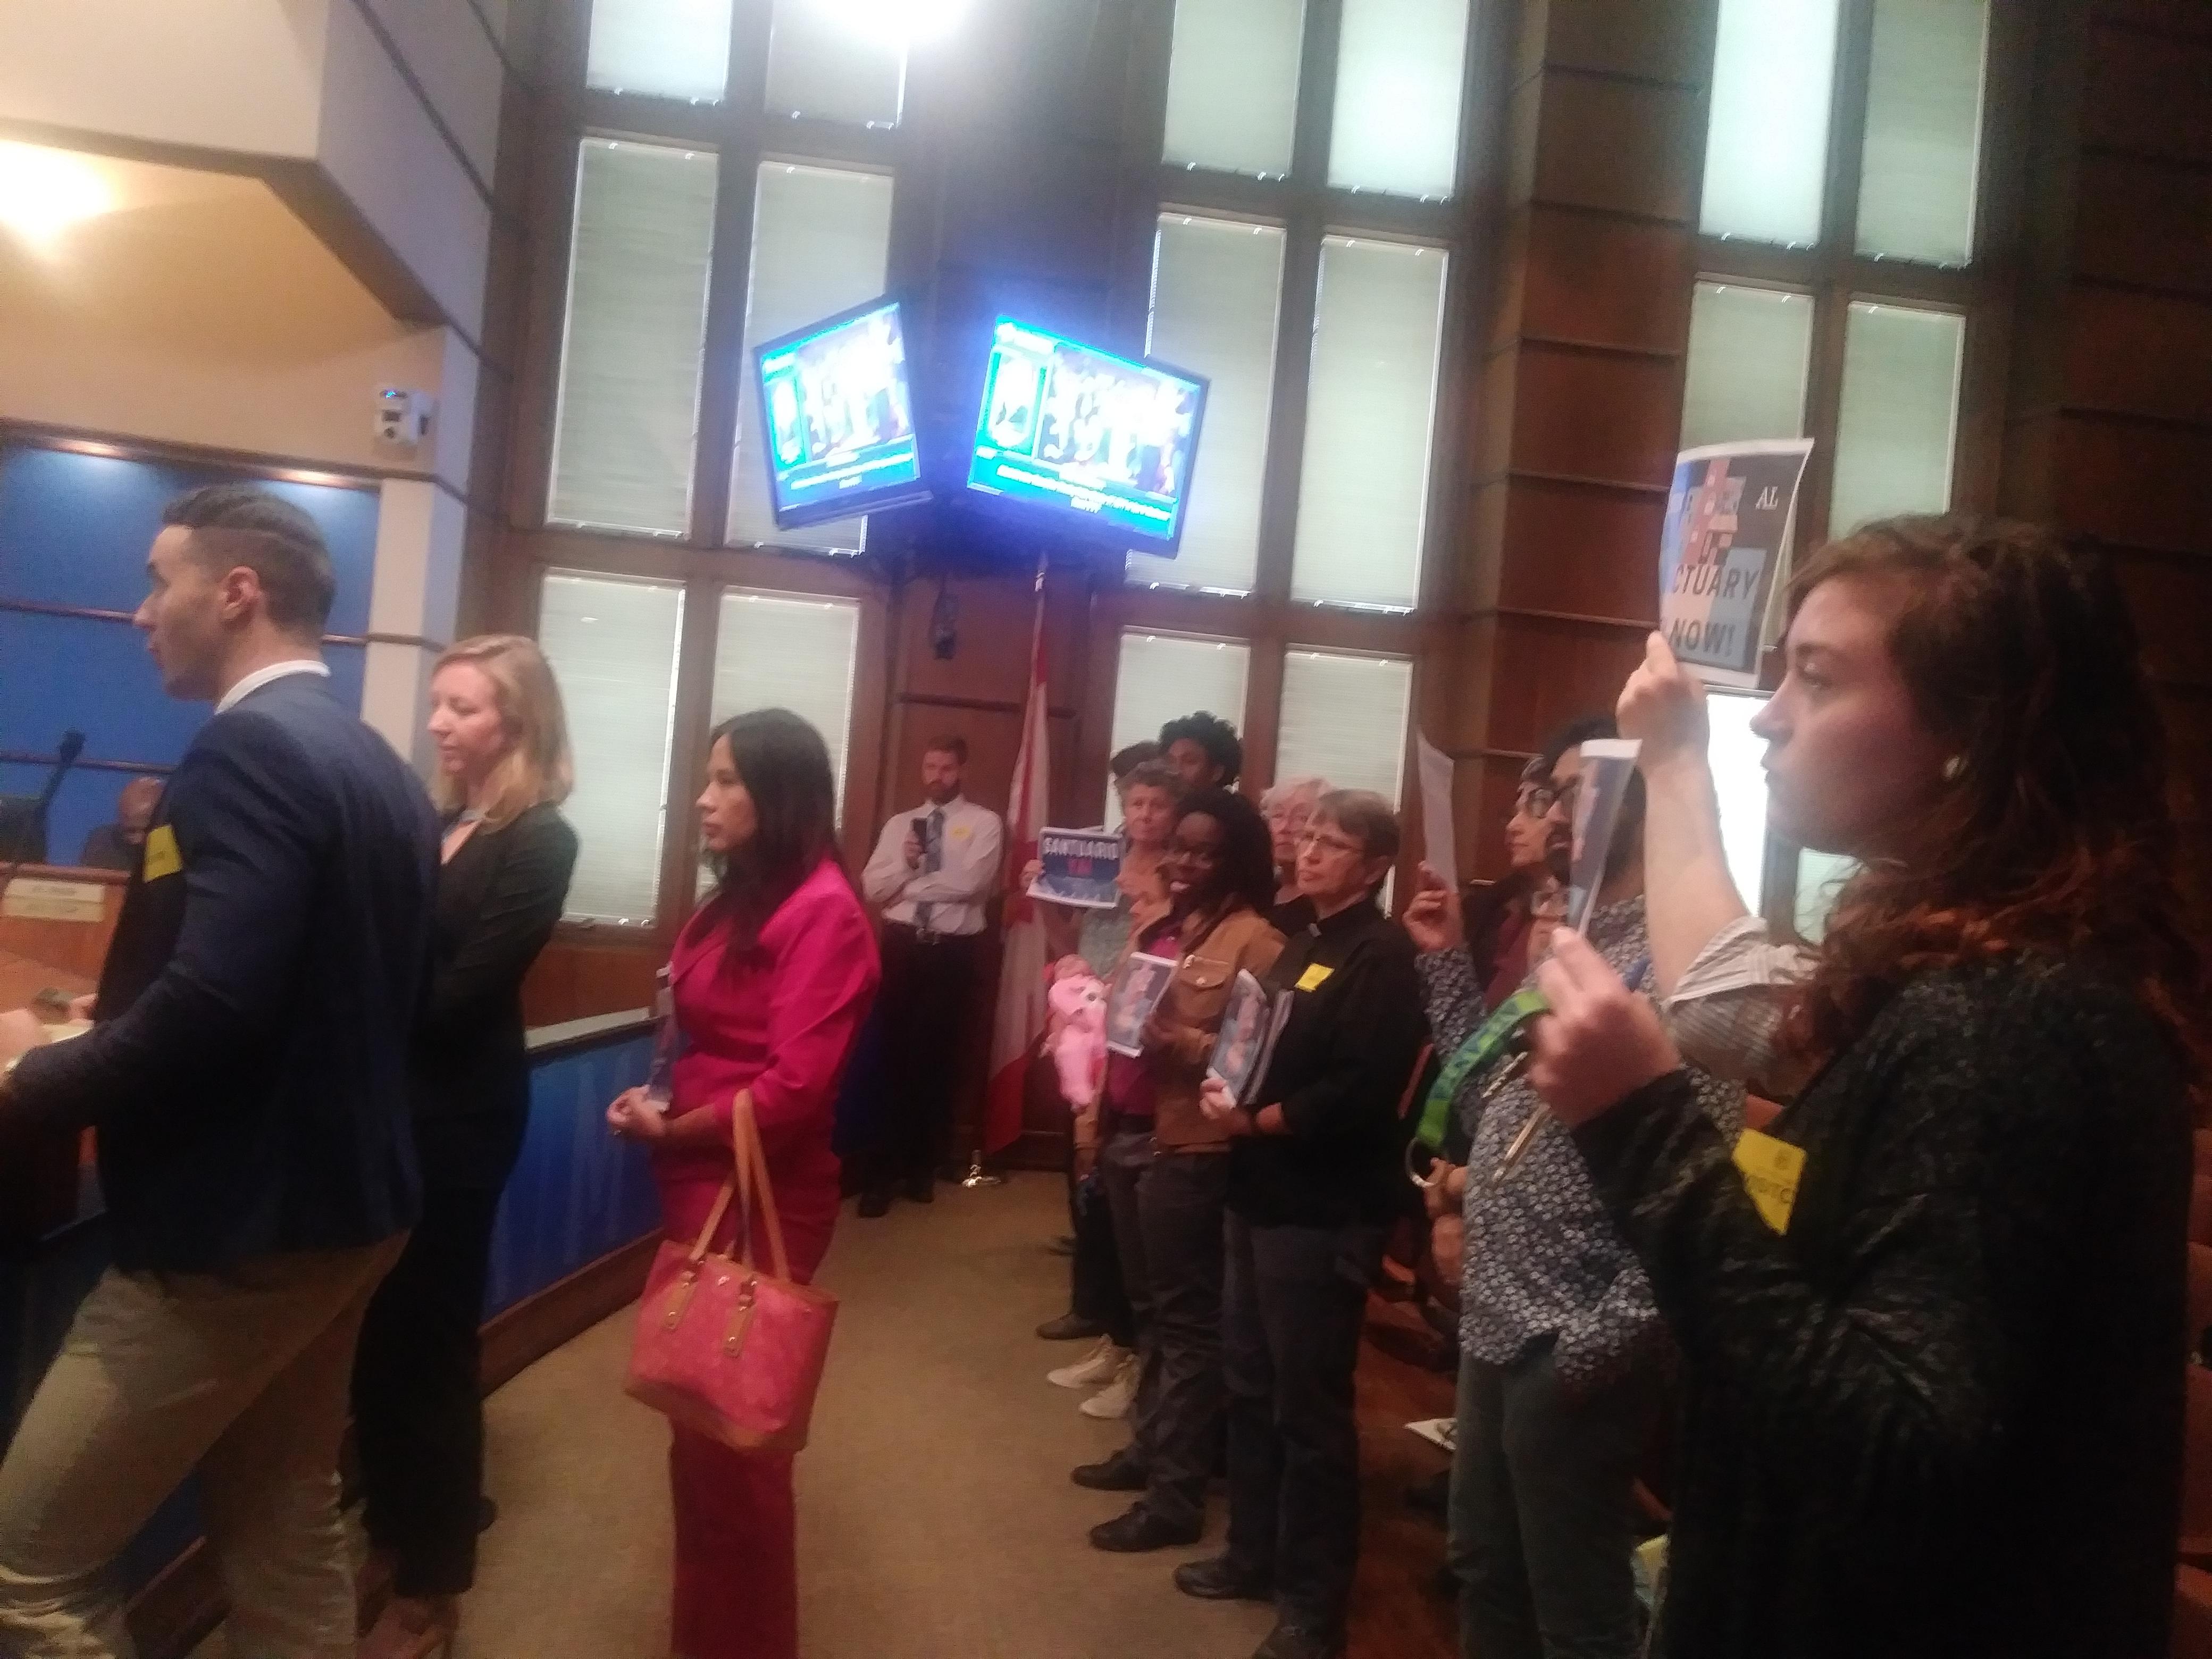 Birmingham City Council hears advocates of sanctuary city ordinance